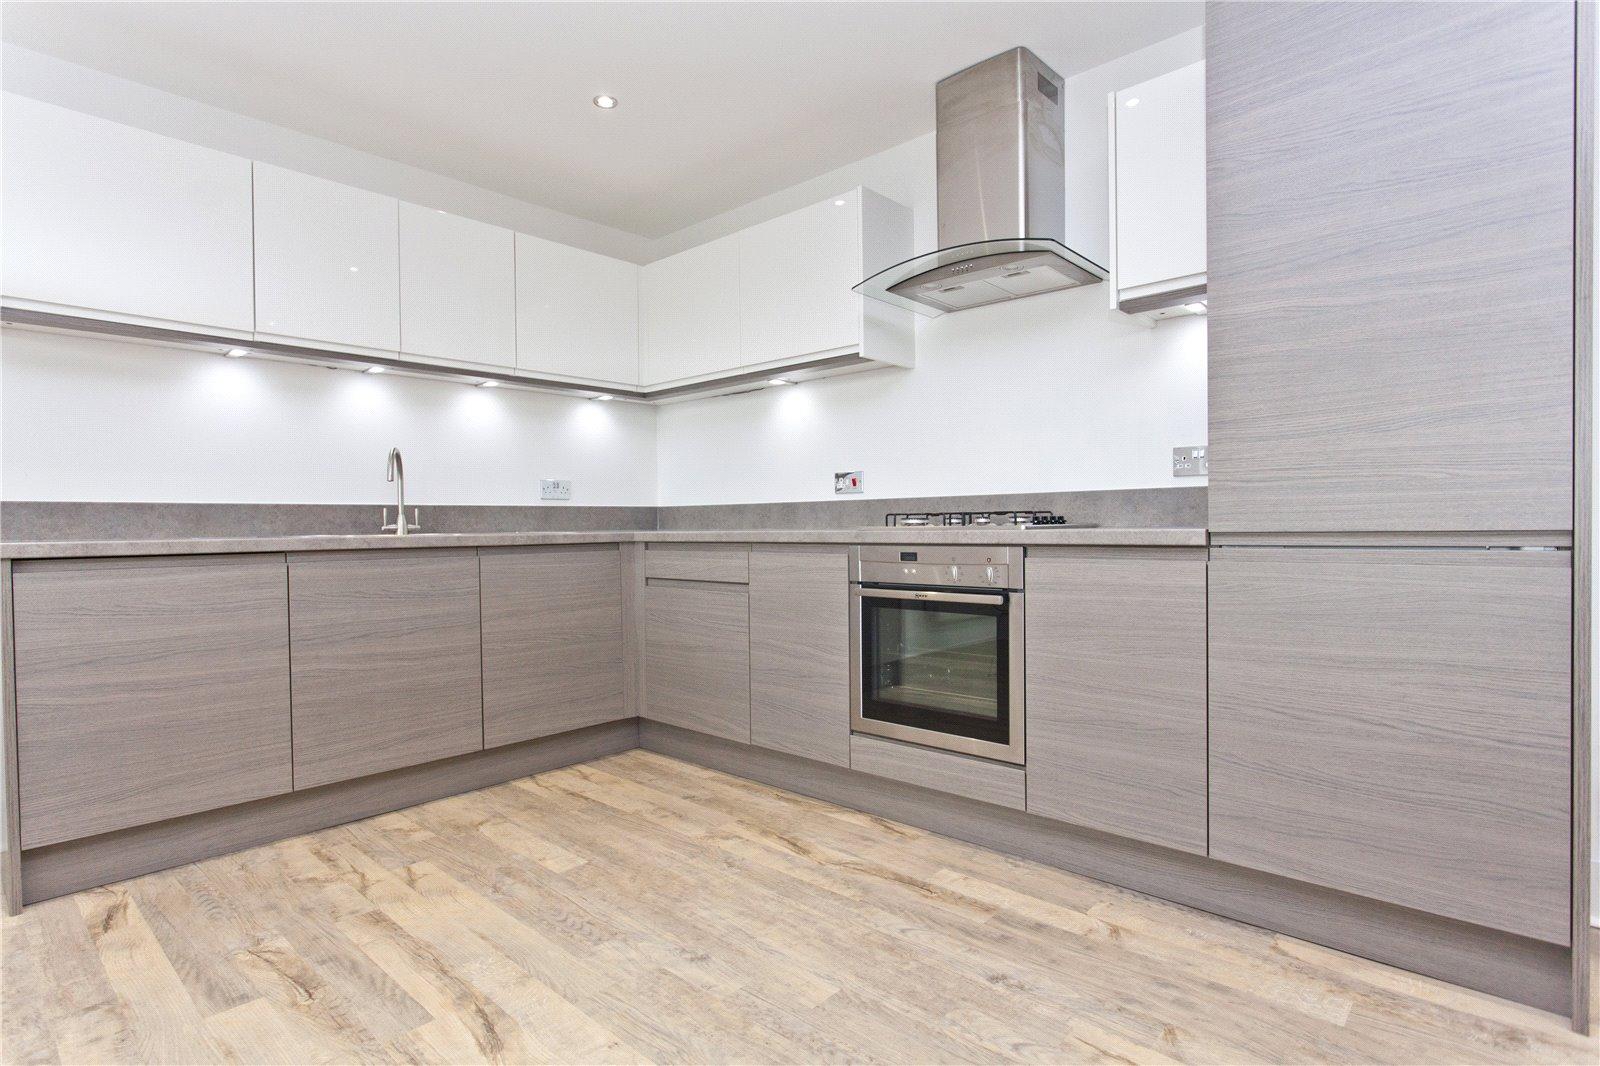 2 bed apartment to rent in Siren, 27B Glen Road, BH14